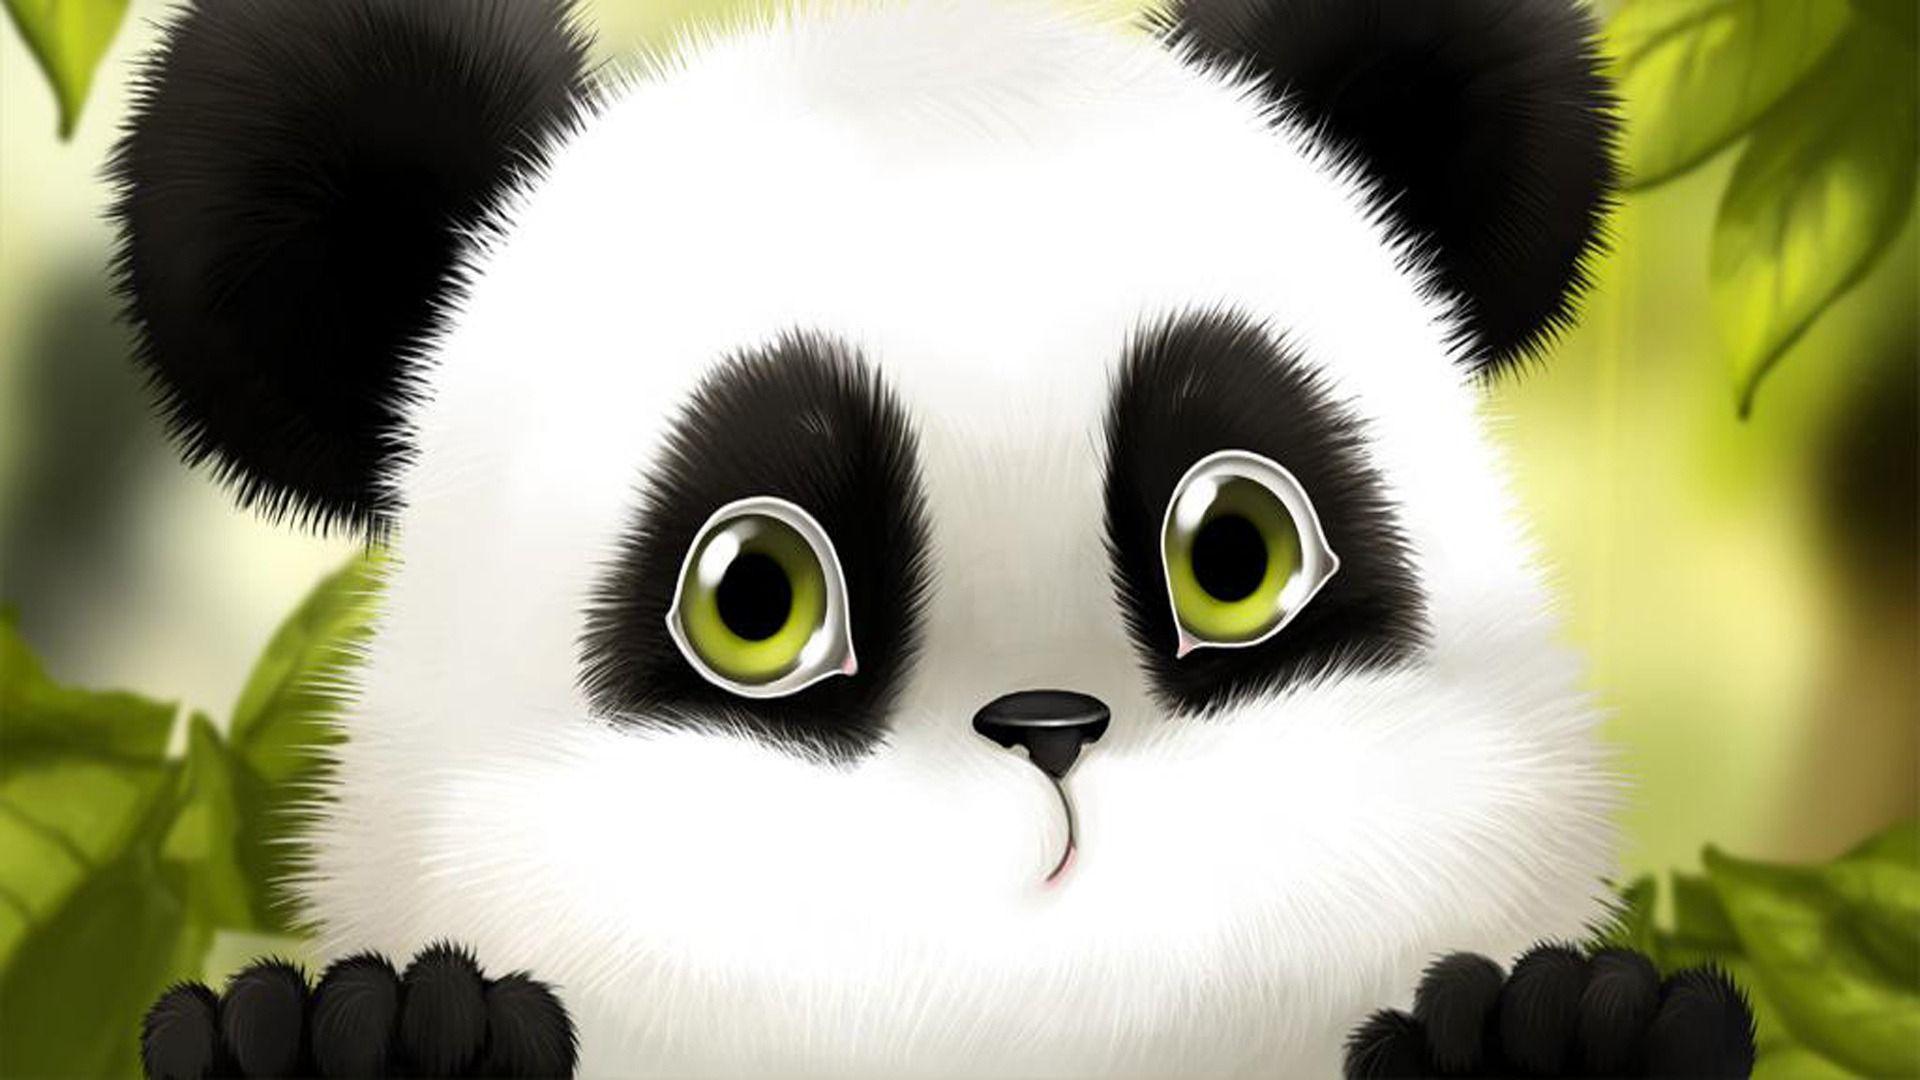 View Similar Wallpaper Panda, Cartoon Size